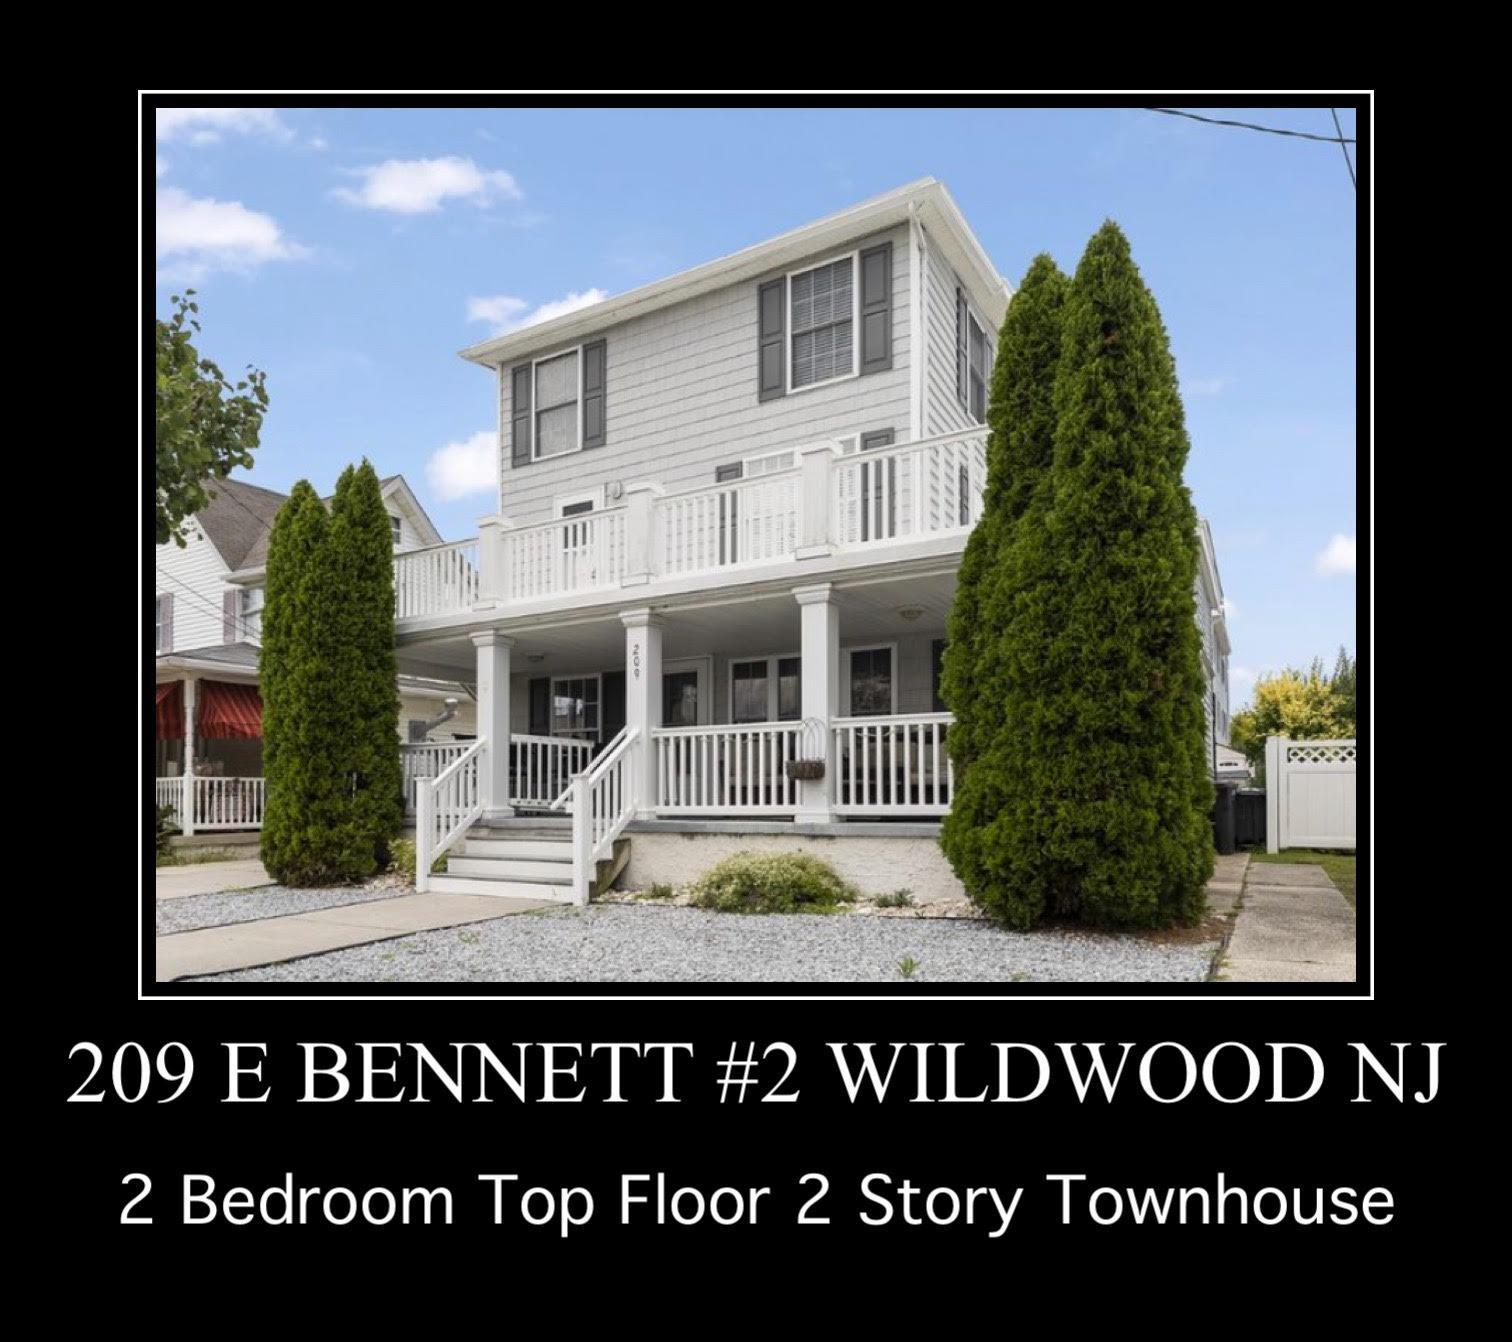 209 E Bennett Avenue - Wildwood